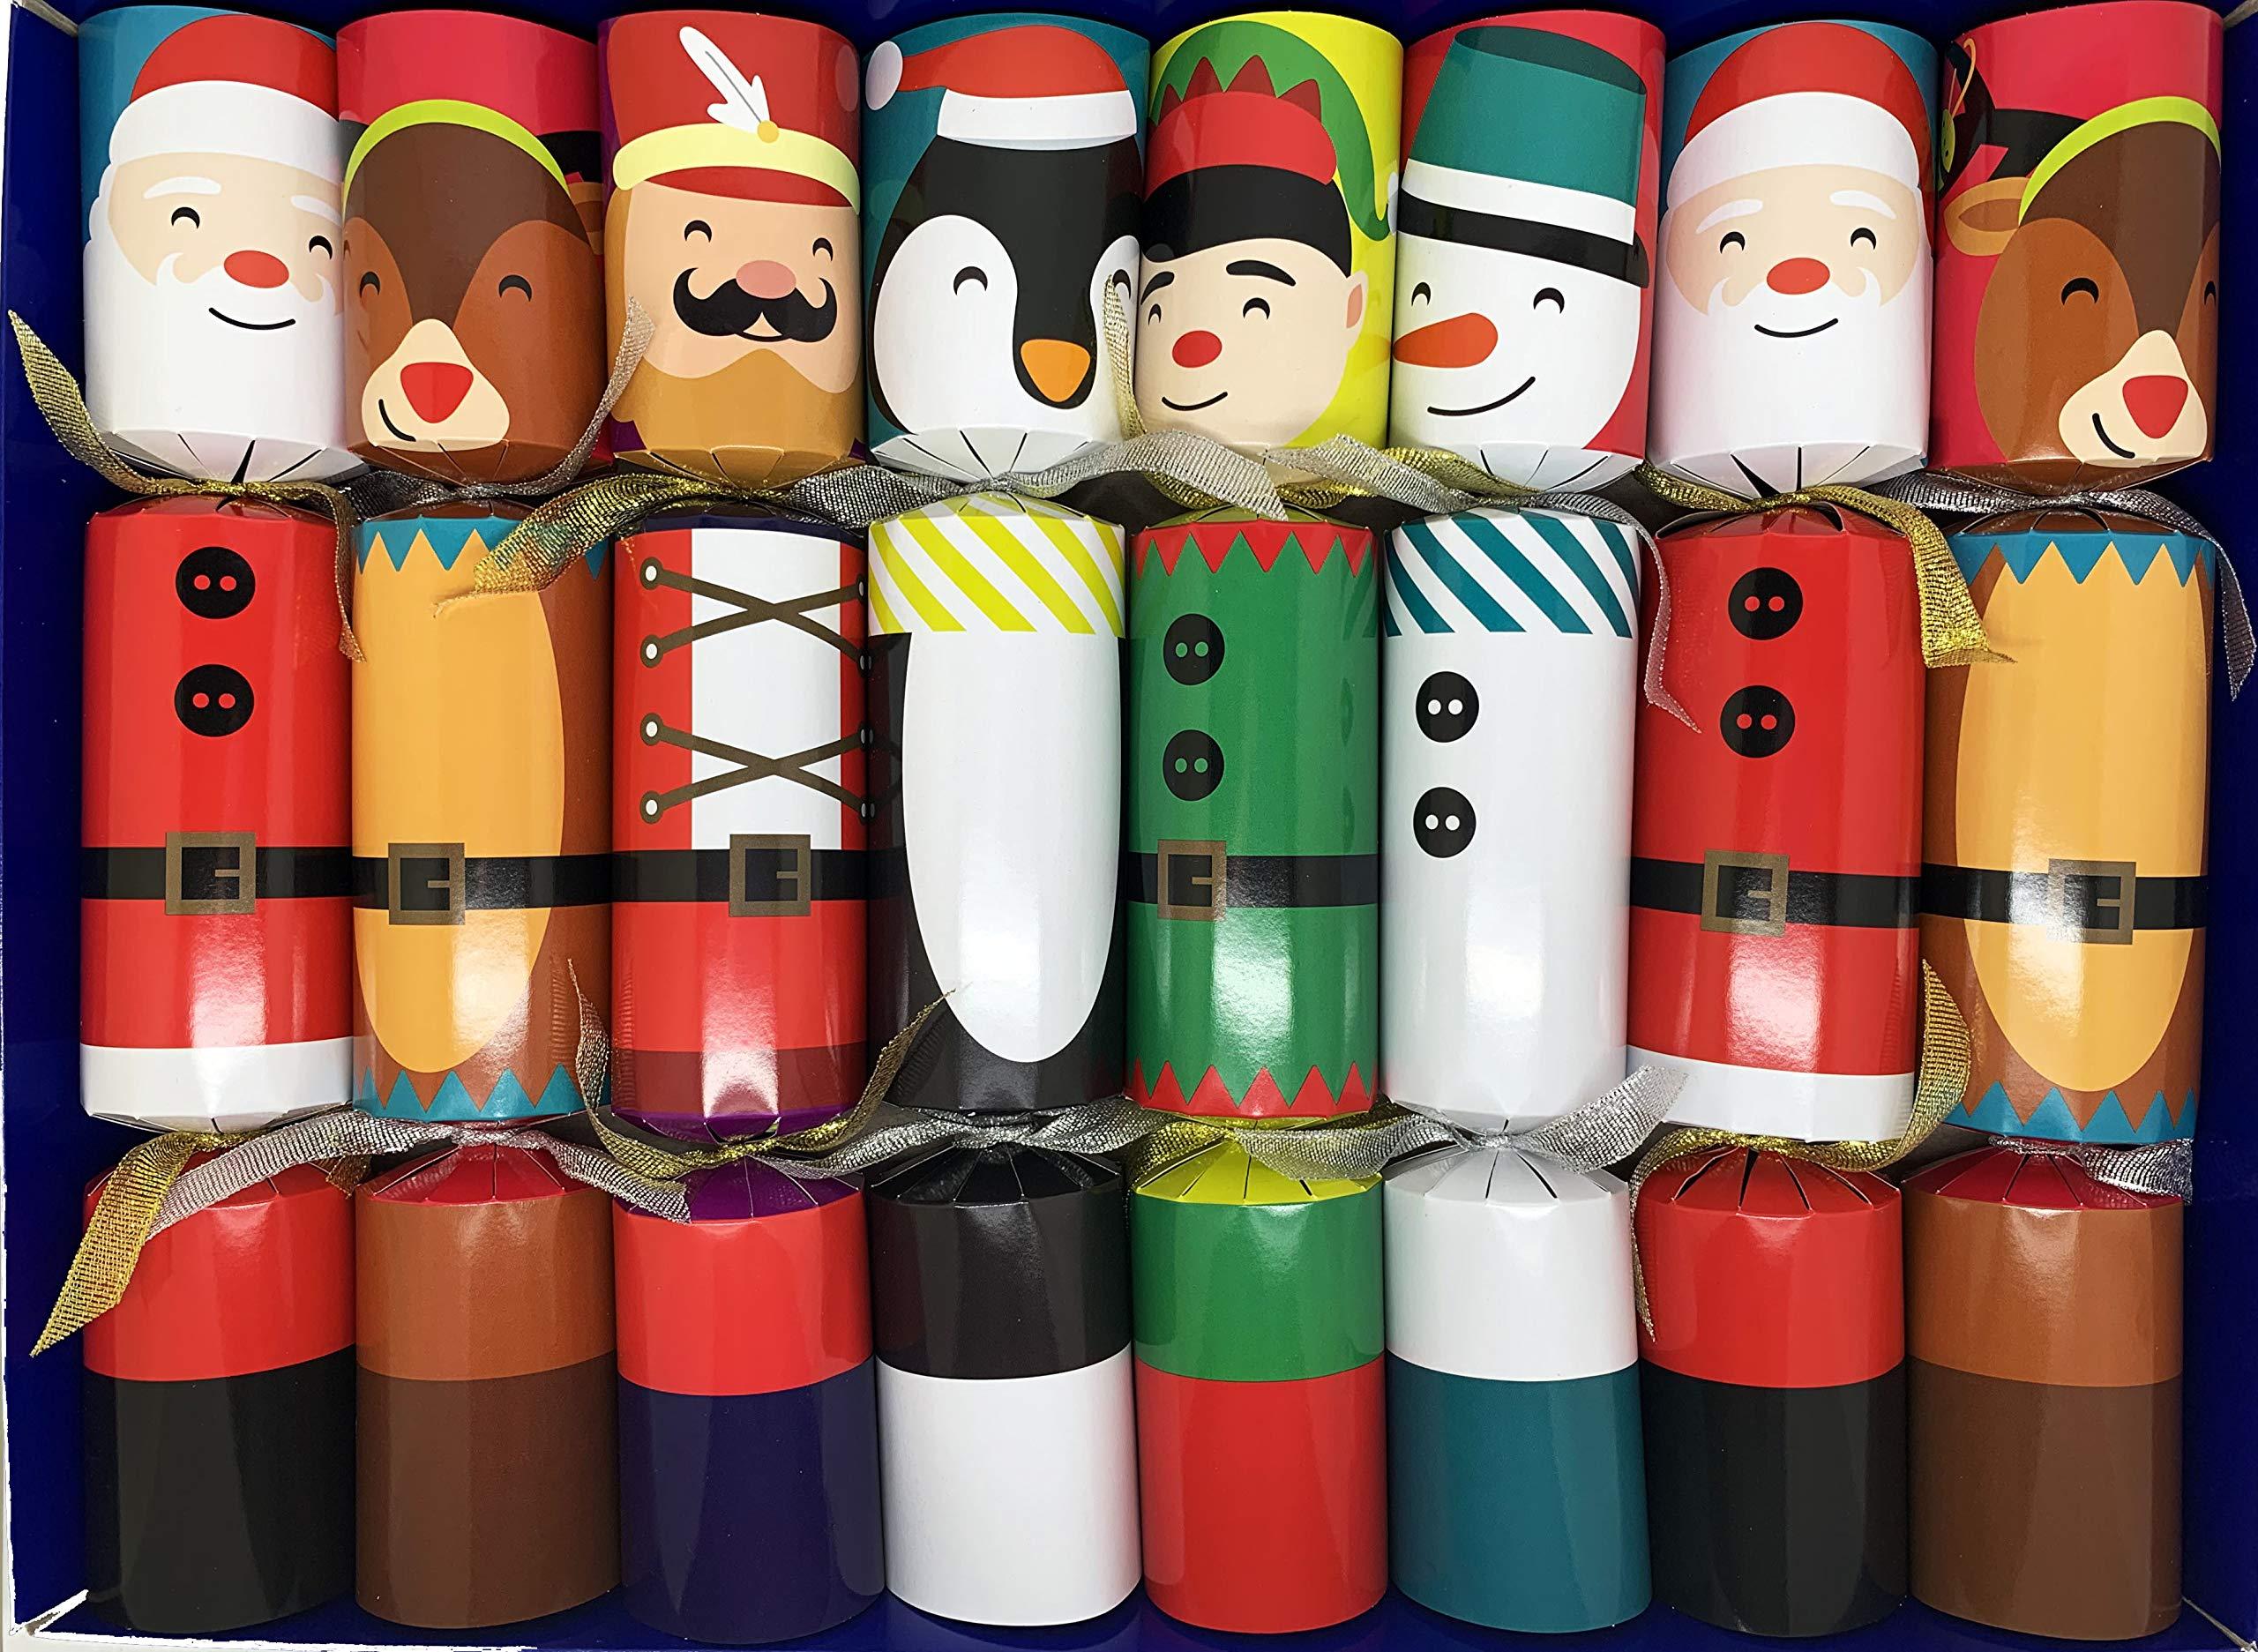 Crackers Ltd Set of 8 Magic Tricks Christmas Crackers in Festive Characters Design - Reindeer, Nutcracker, Snowman, Elf, Santa and Penguin